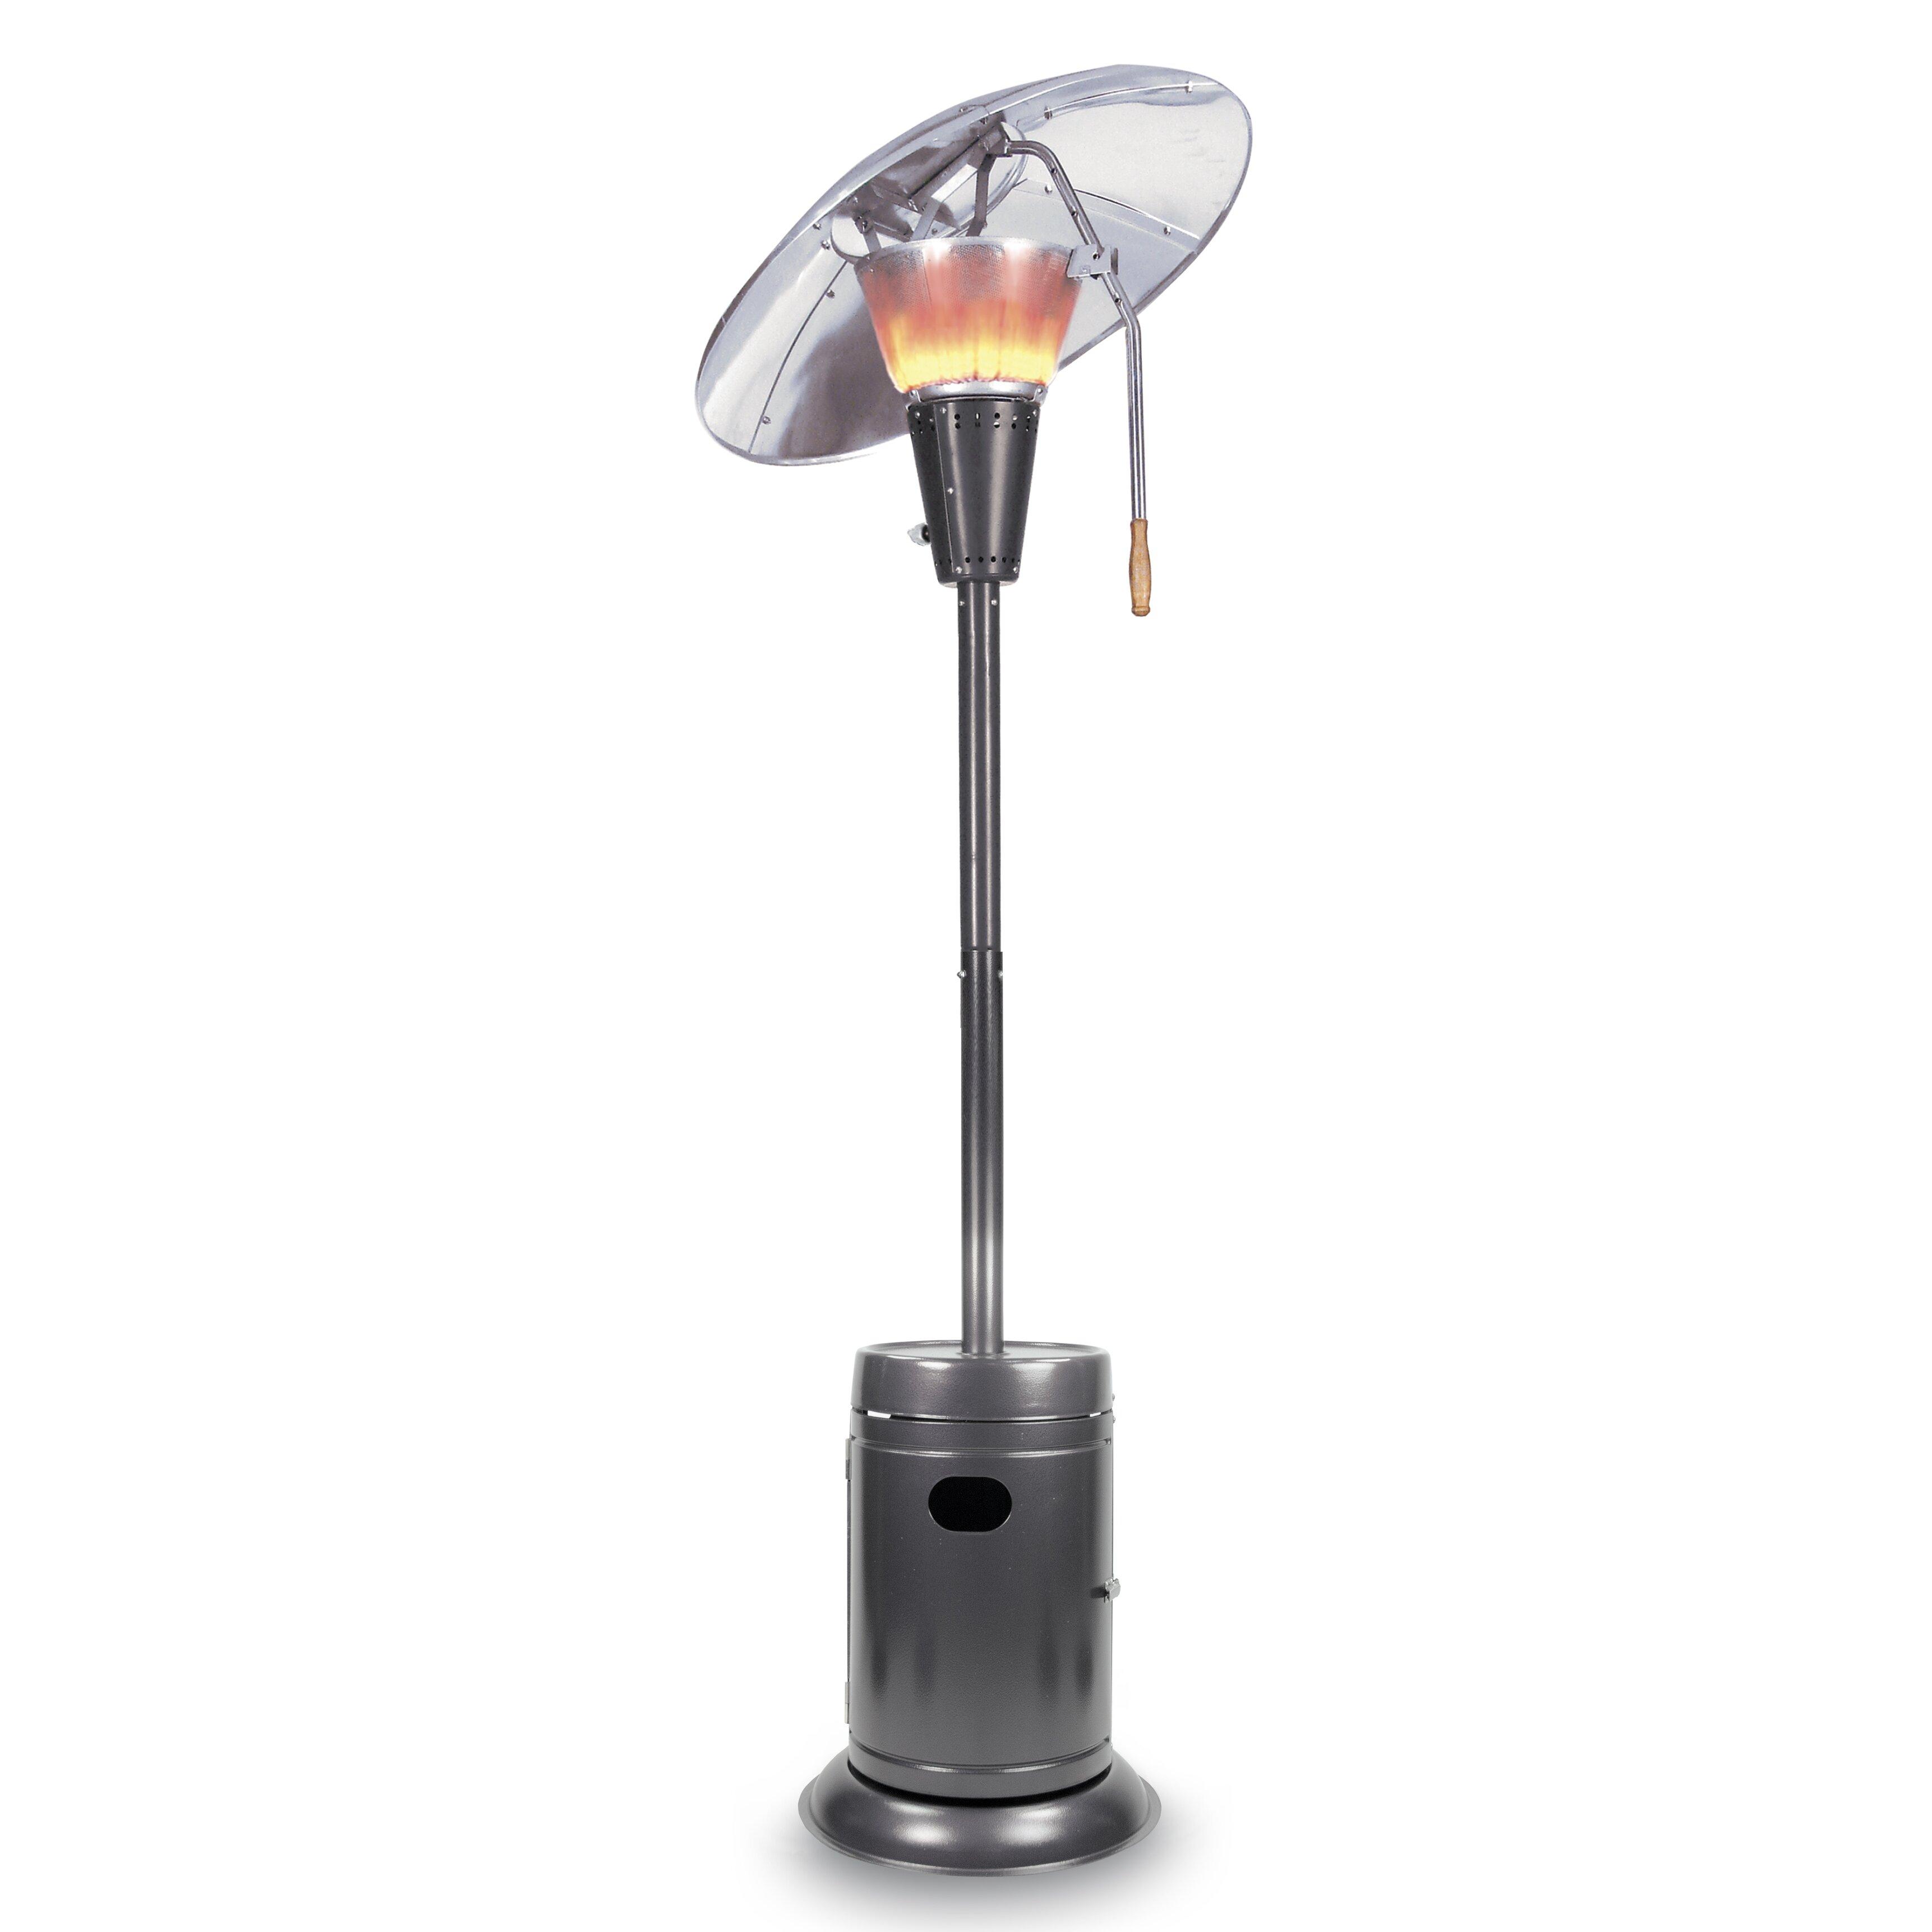 Mirage Heat Focus 38 200 BTU Propane Patio Heater